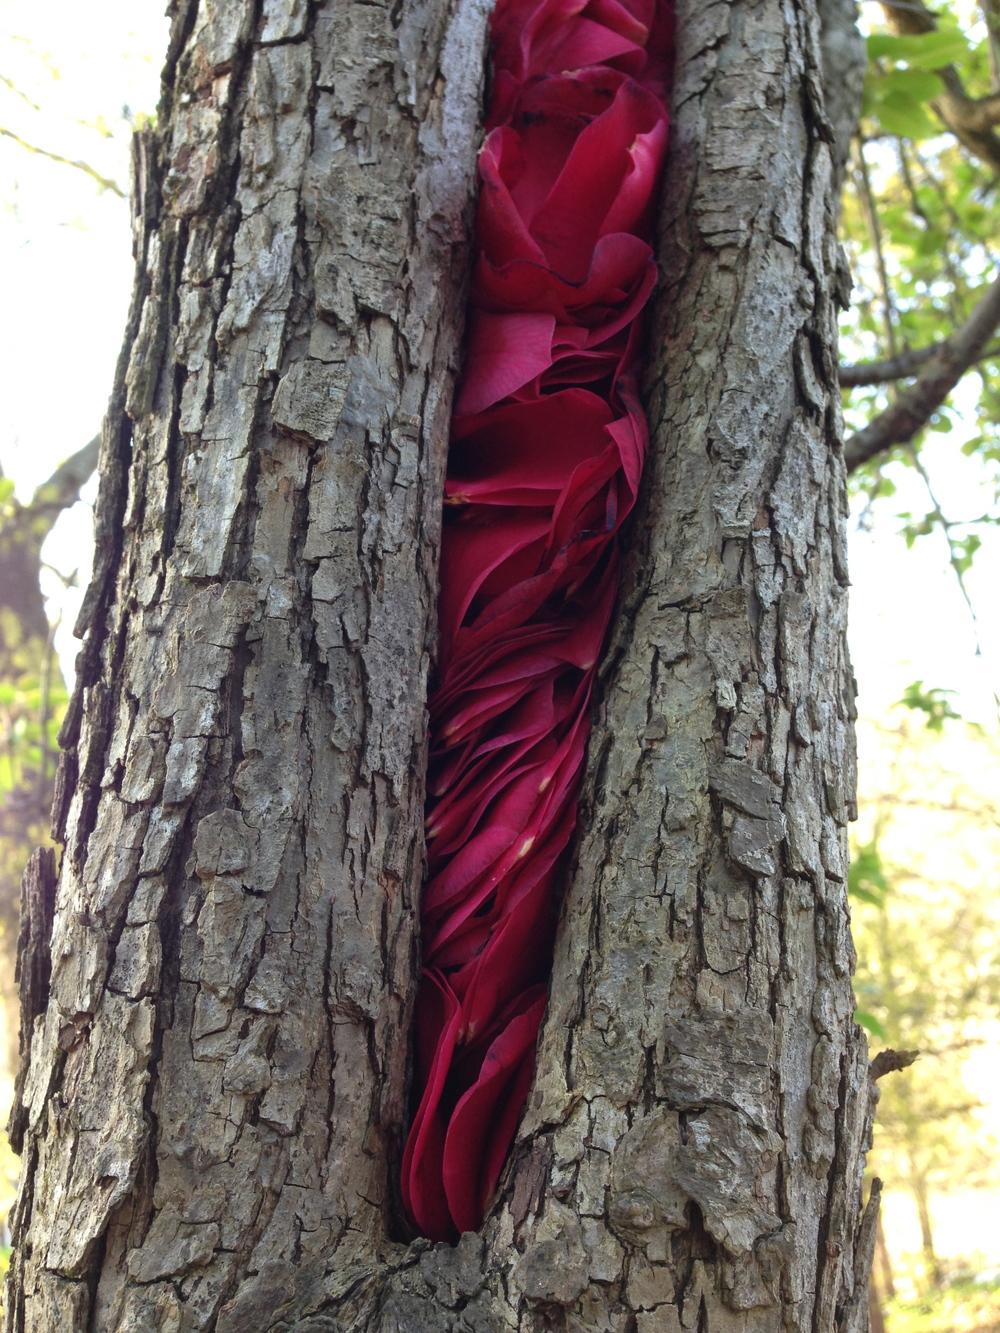 Camellia petals in pear tree. Athens, GA. Spring 2013.